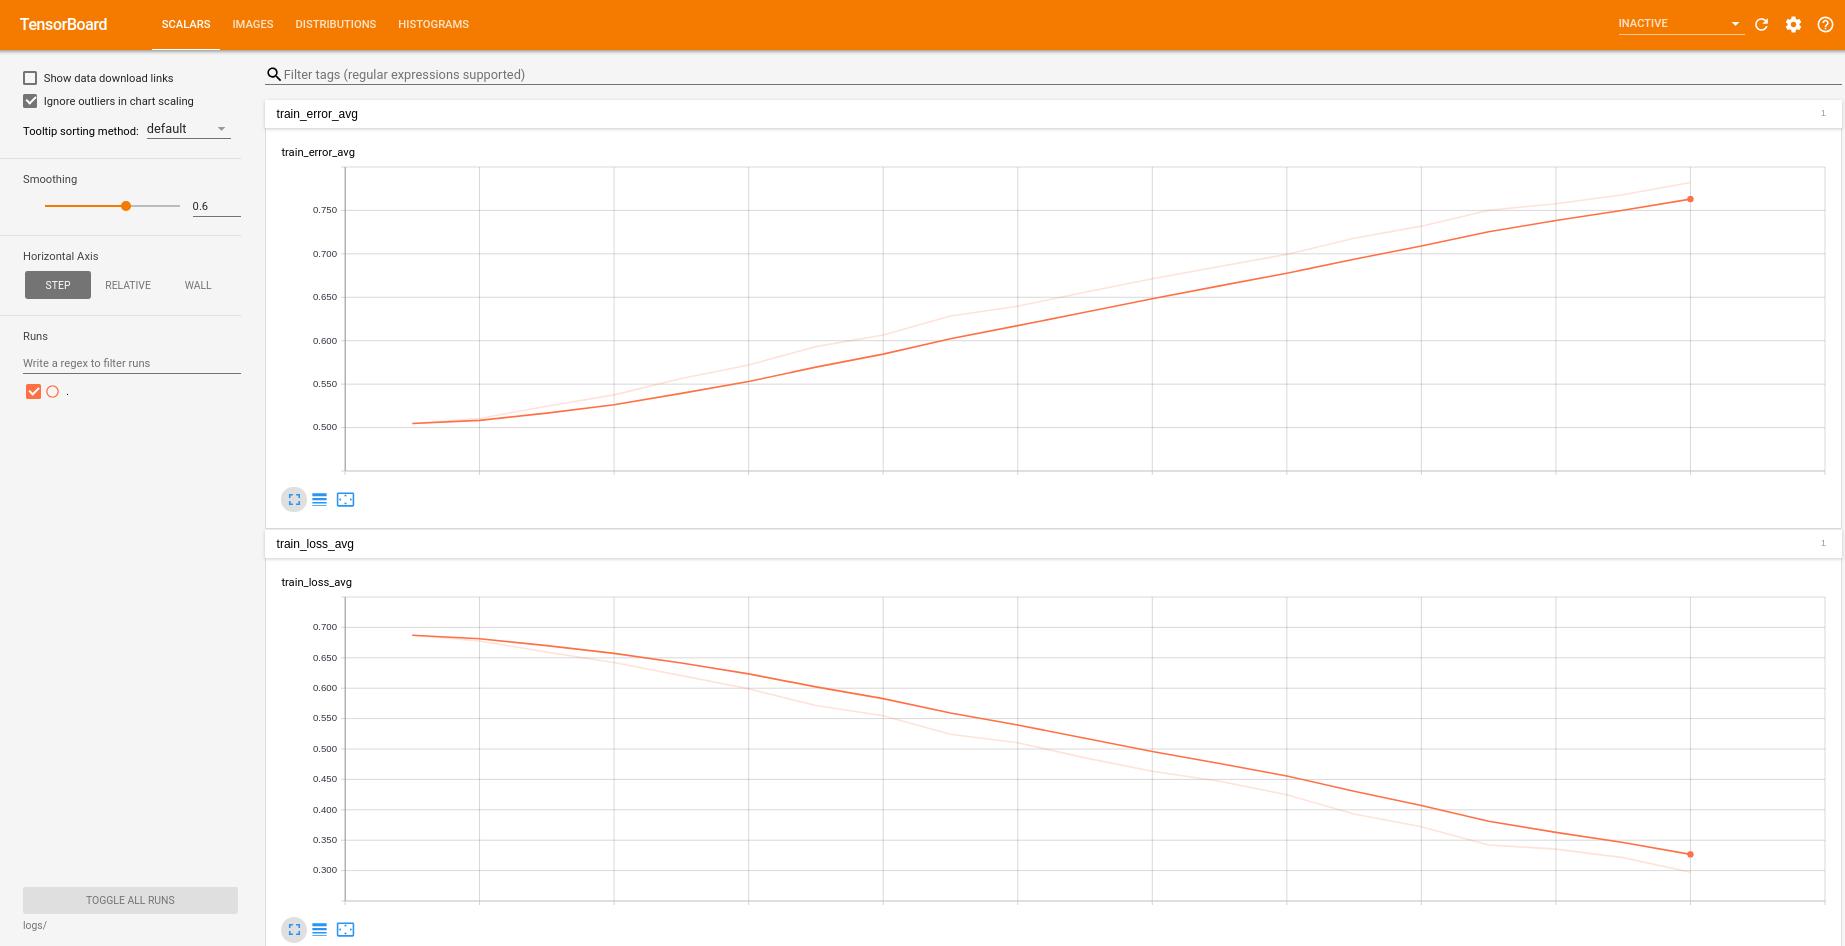 GitHub - wolny/pytorch-3dunet: 3D U-Net model for volumetric